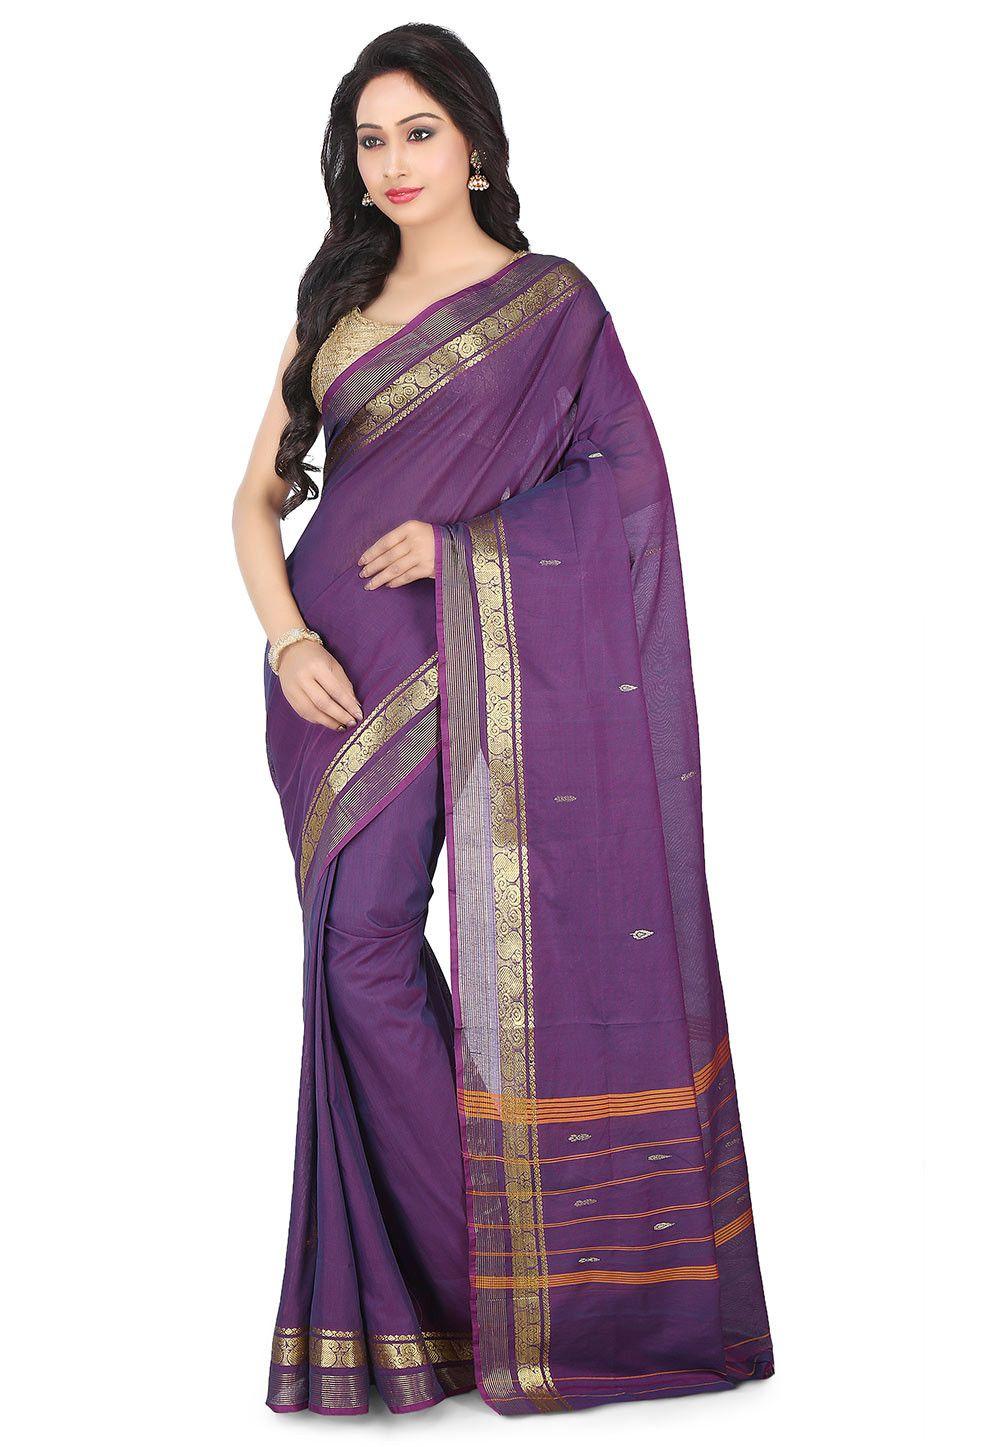 Saree images paithani woven south cotton silk saree in purple  sarees  pinterest  silk